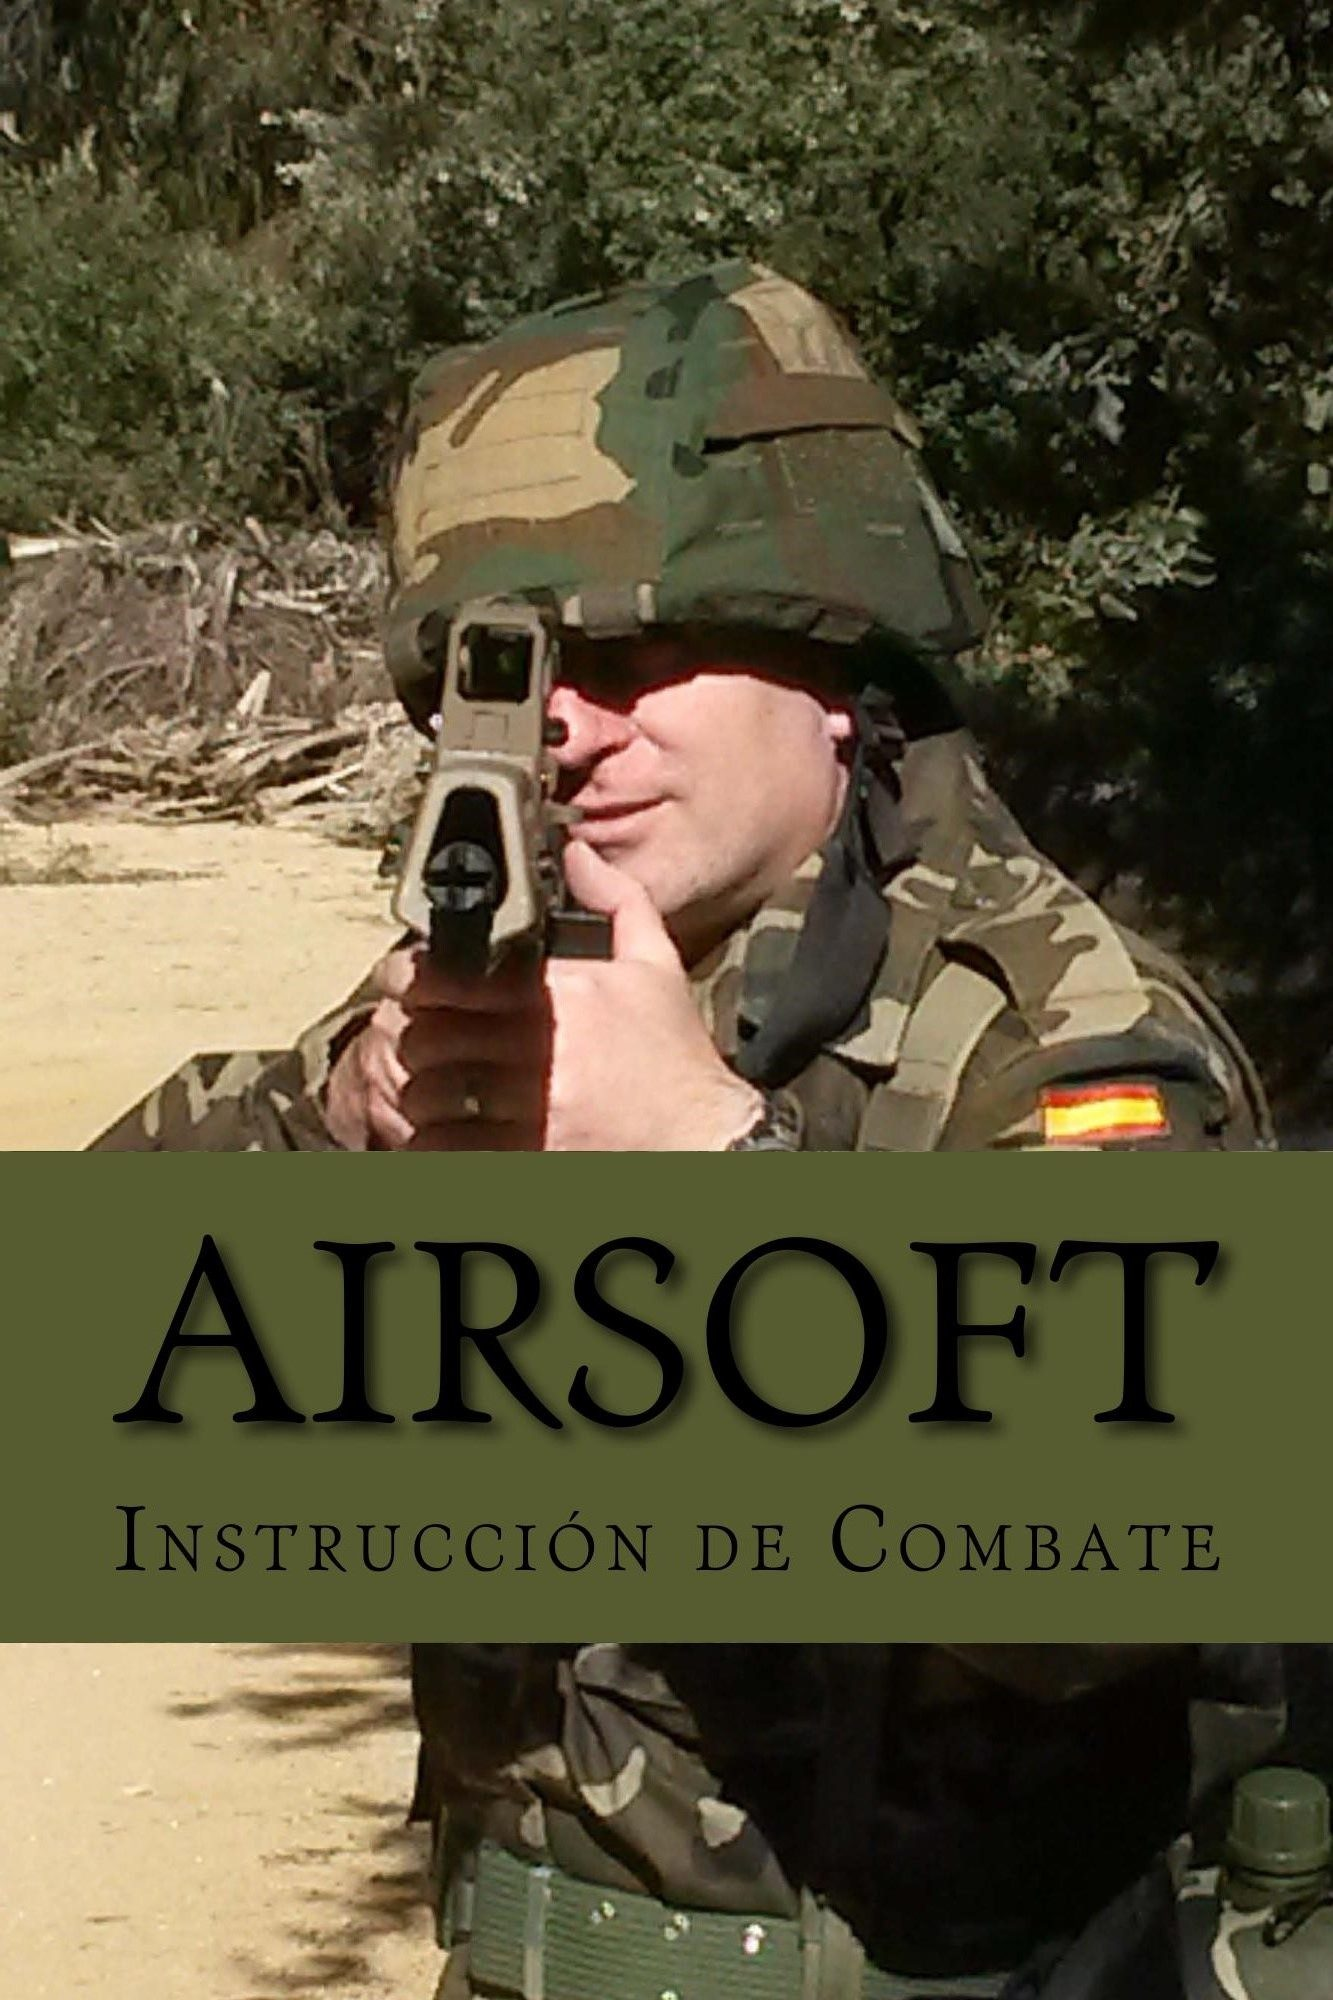 Airsoft Instrucci N De Combate Ebook Ebooks El Corte Ingl S ~ Sillon De Lactancia El Corte Ingles